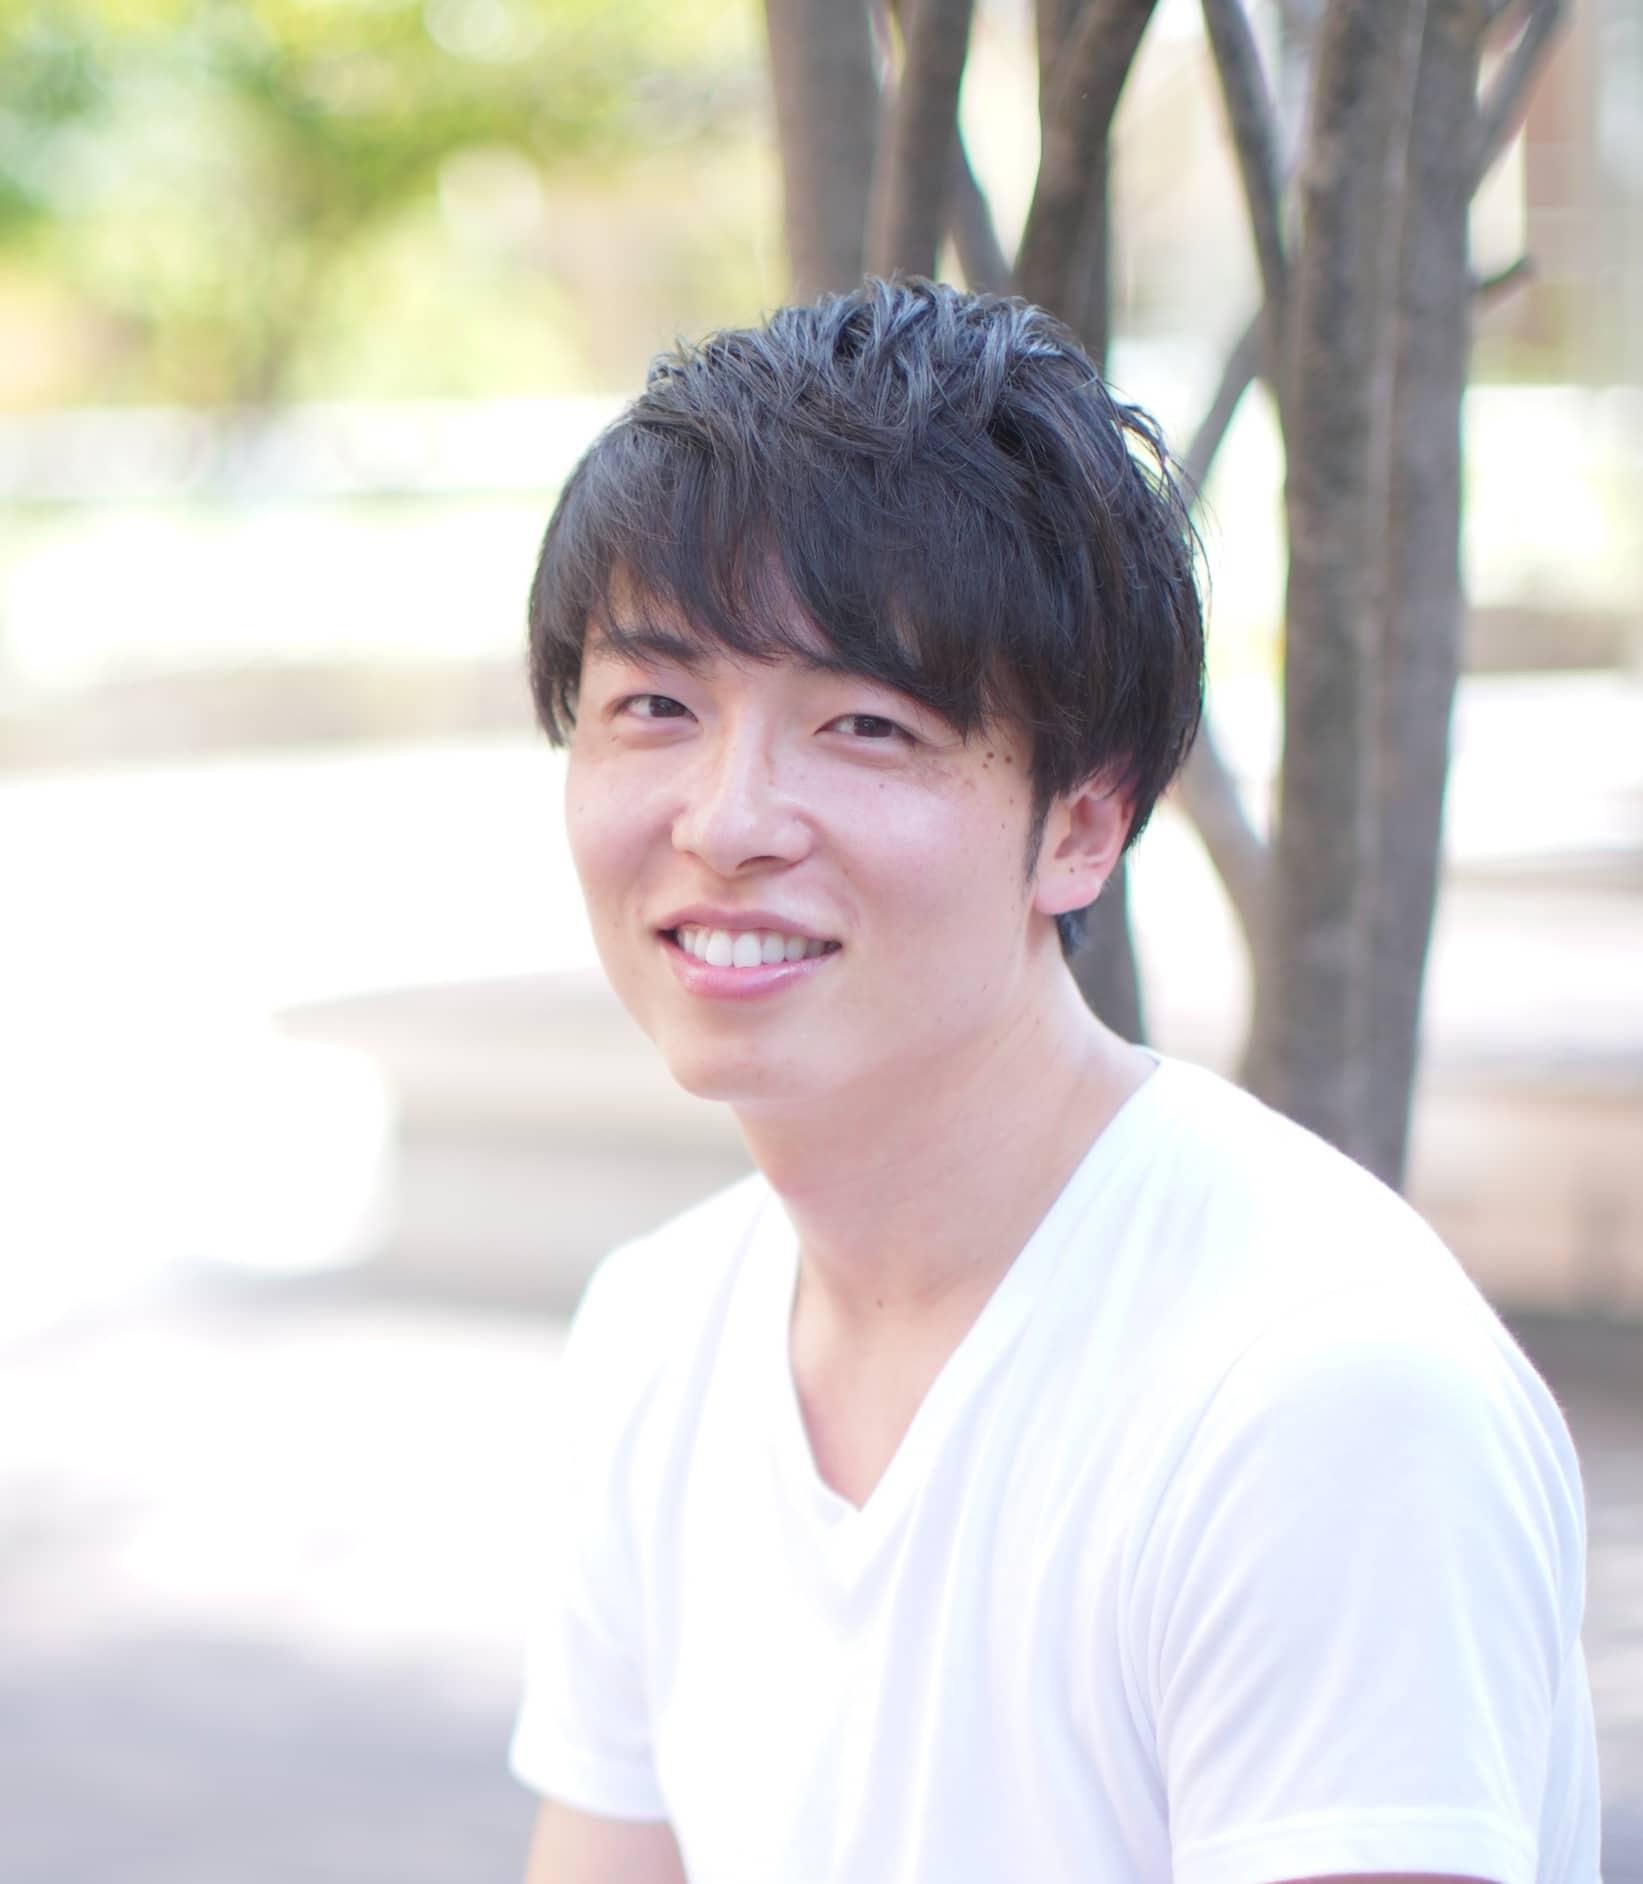 Masataka Shintoku | Code Chrysalis Tokyo Coding Bootcamp